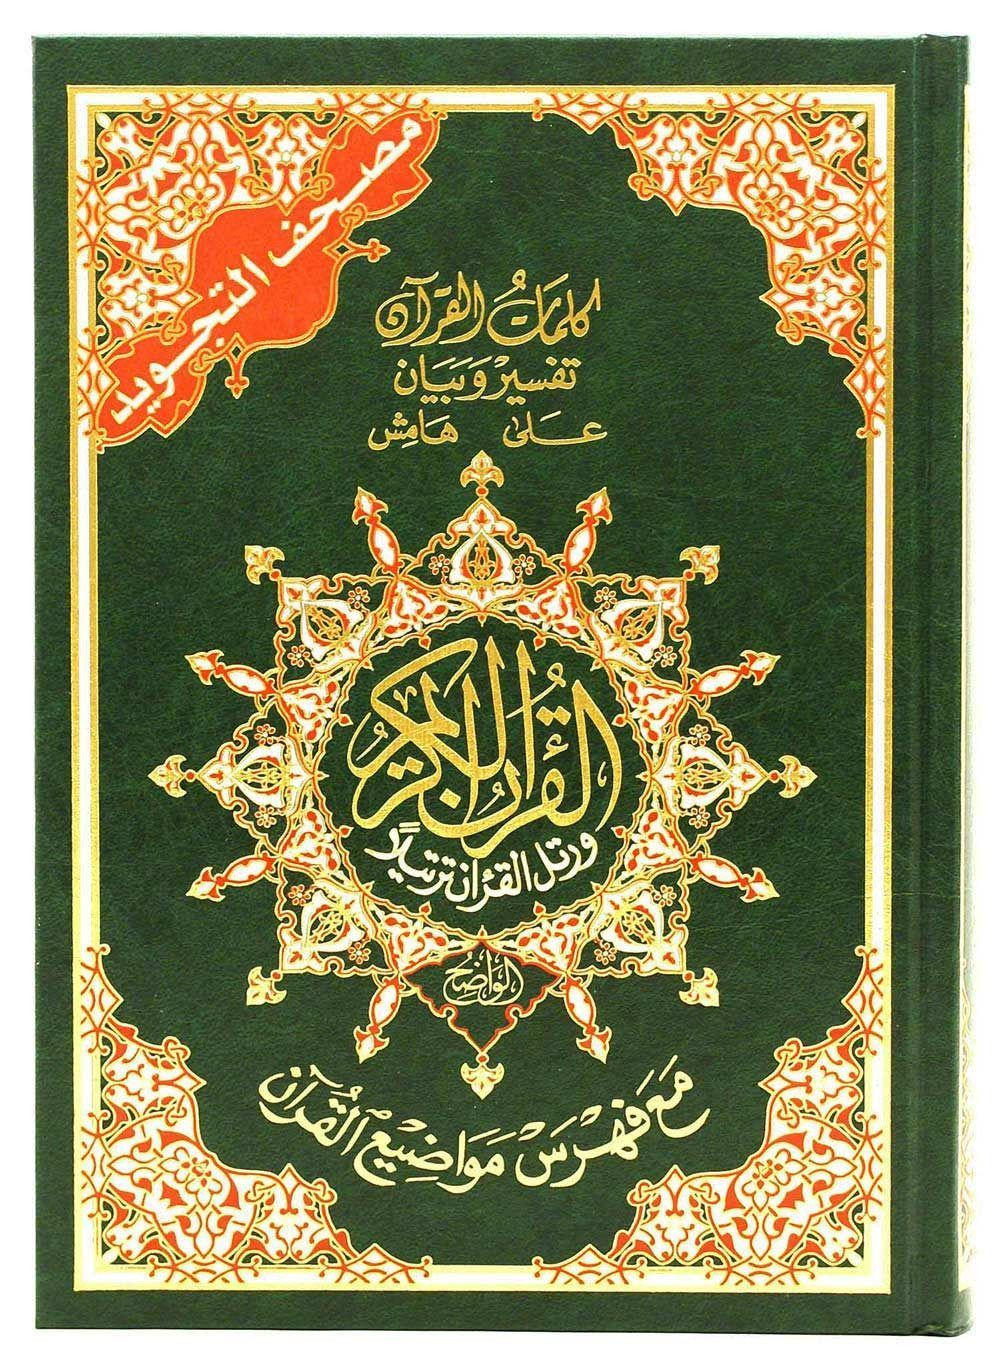 Tajweed Quran With Case Avec Images Saint Coran Coran Livre Islam